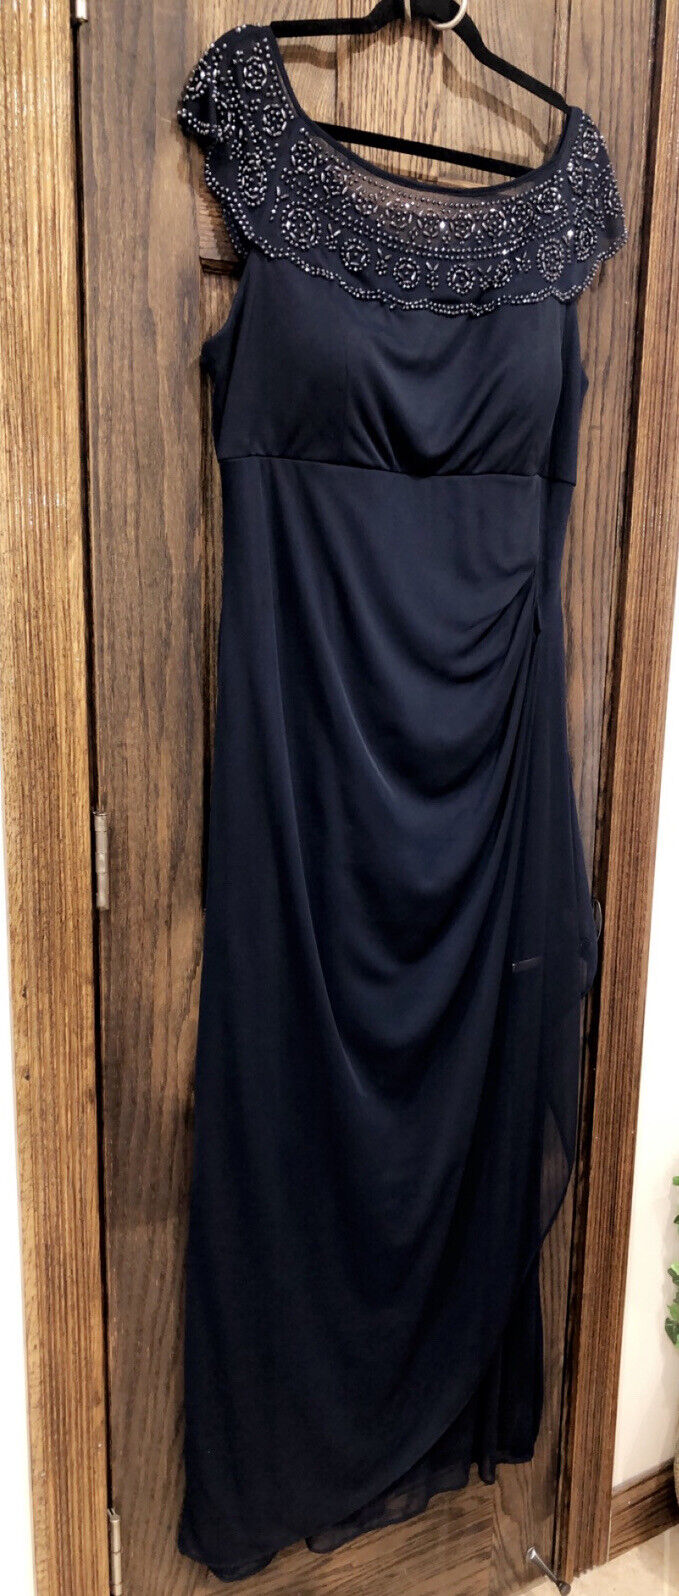 Women's Formal Dress Size 16 MSK Evening Navy Blue Gown Beaded Neckline #C14